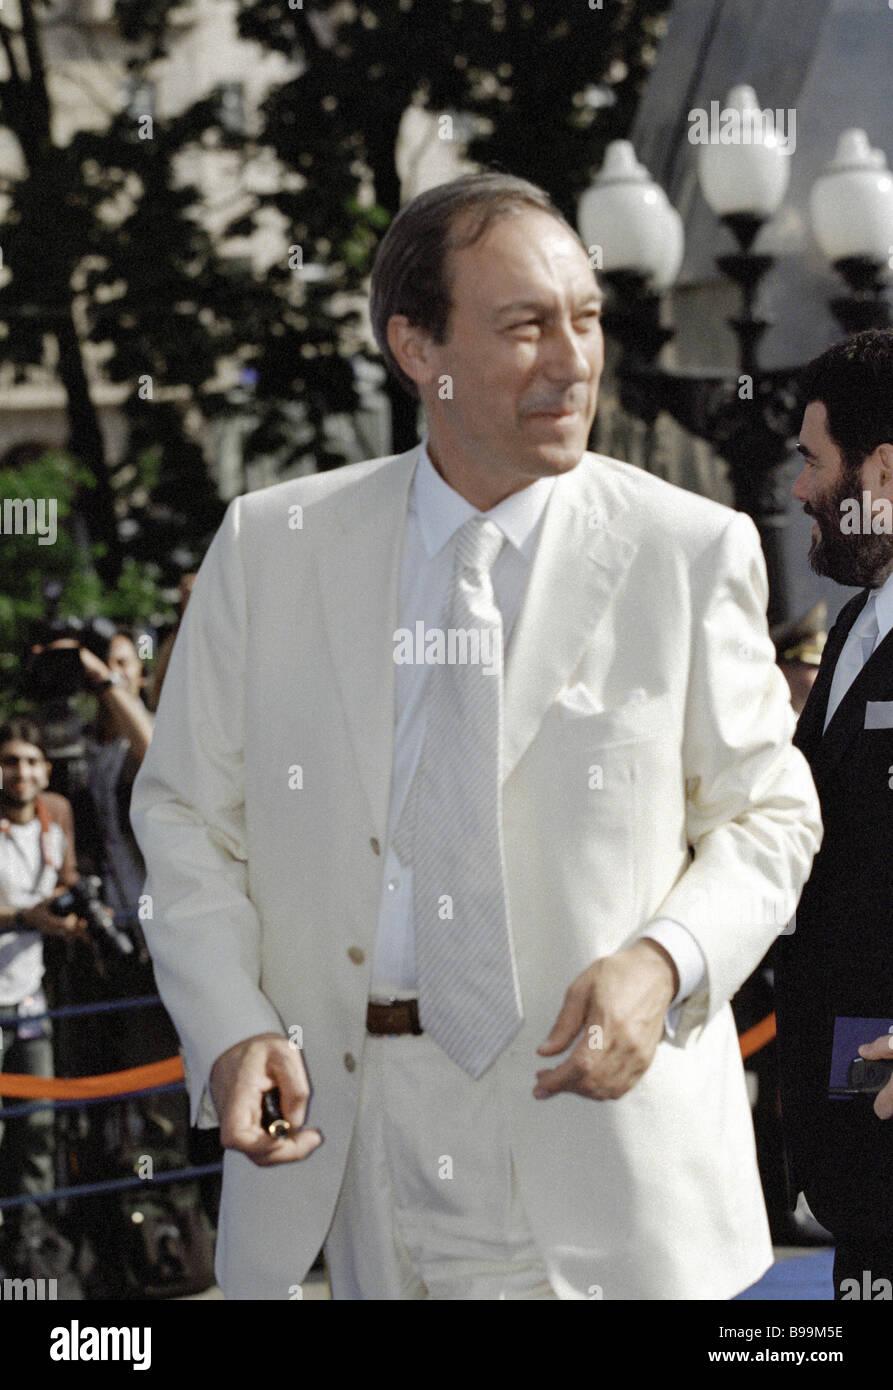 Pavel Kuzmin - theater and film actor 36